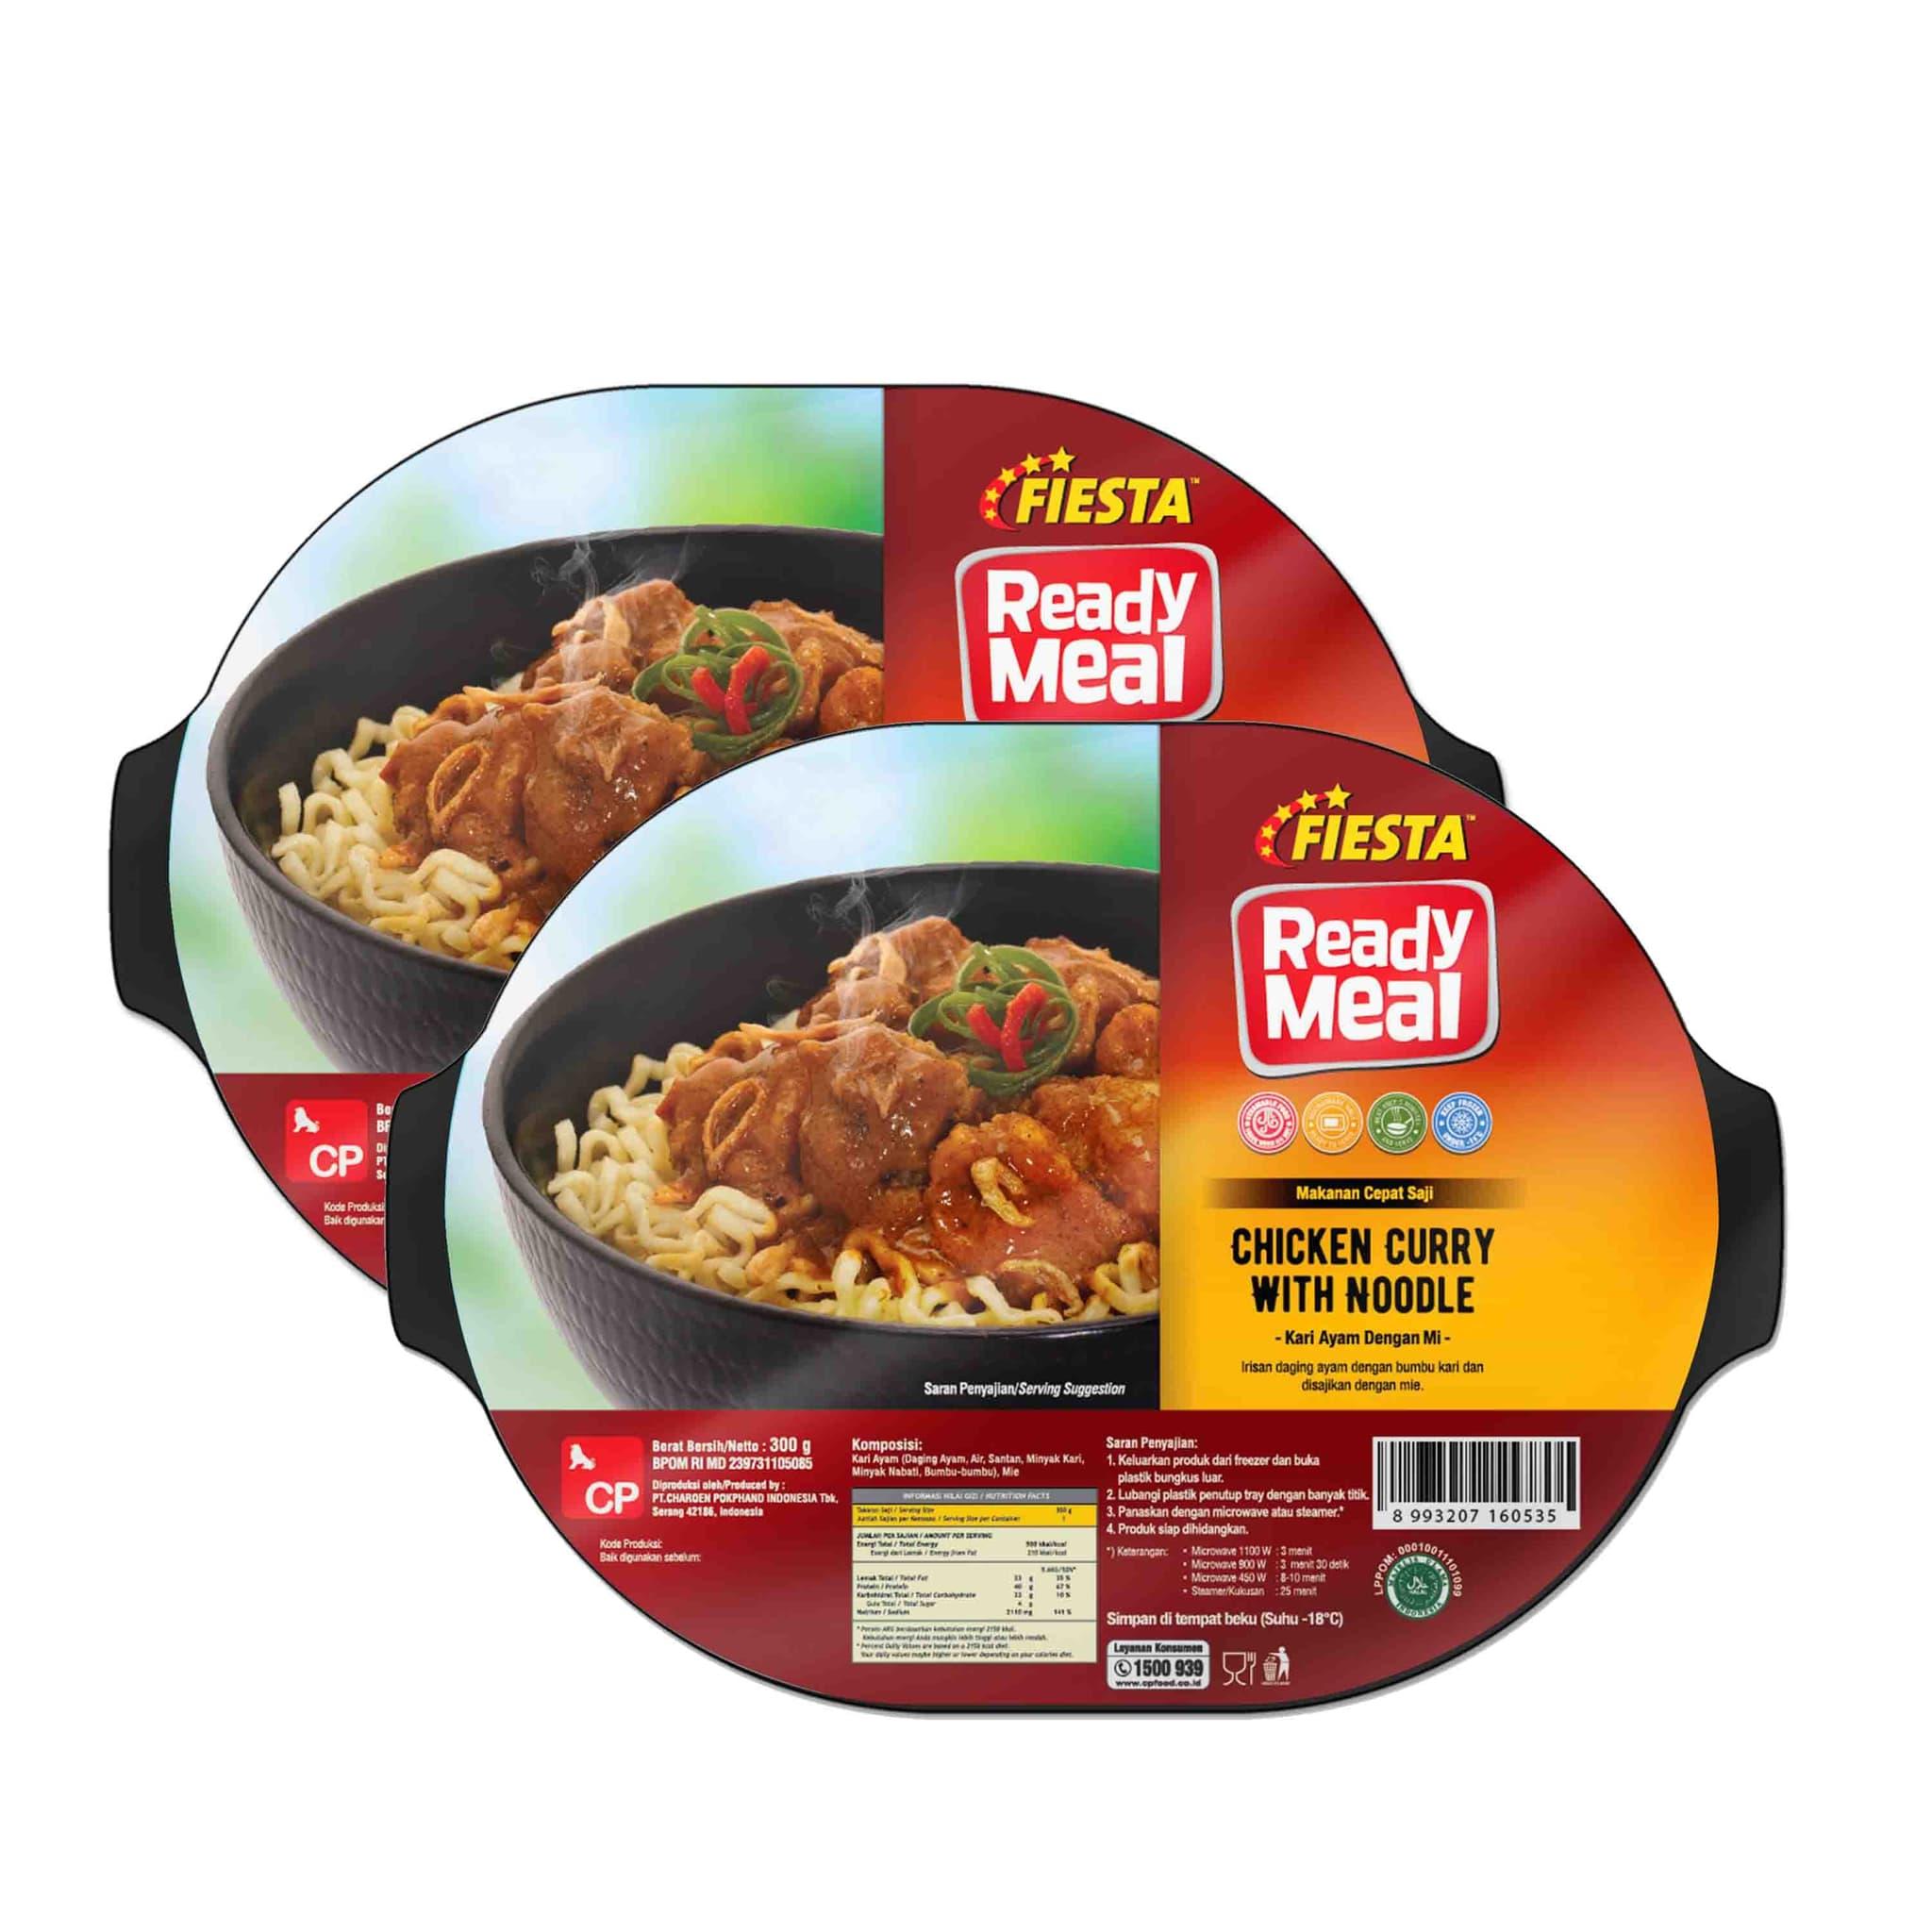 Promo Fiesta Chic Curry W/ Noodle 6pcs  (Mohon Segera Dikonsumsi) - Blanja.com